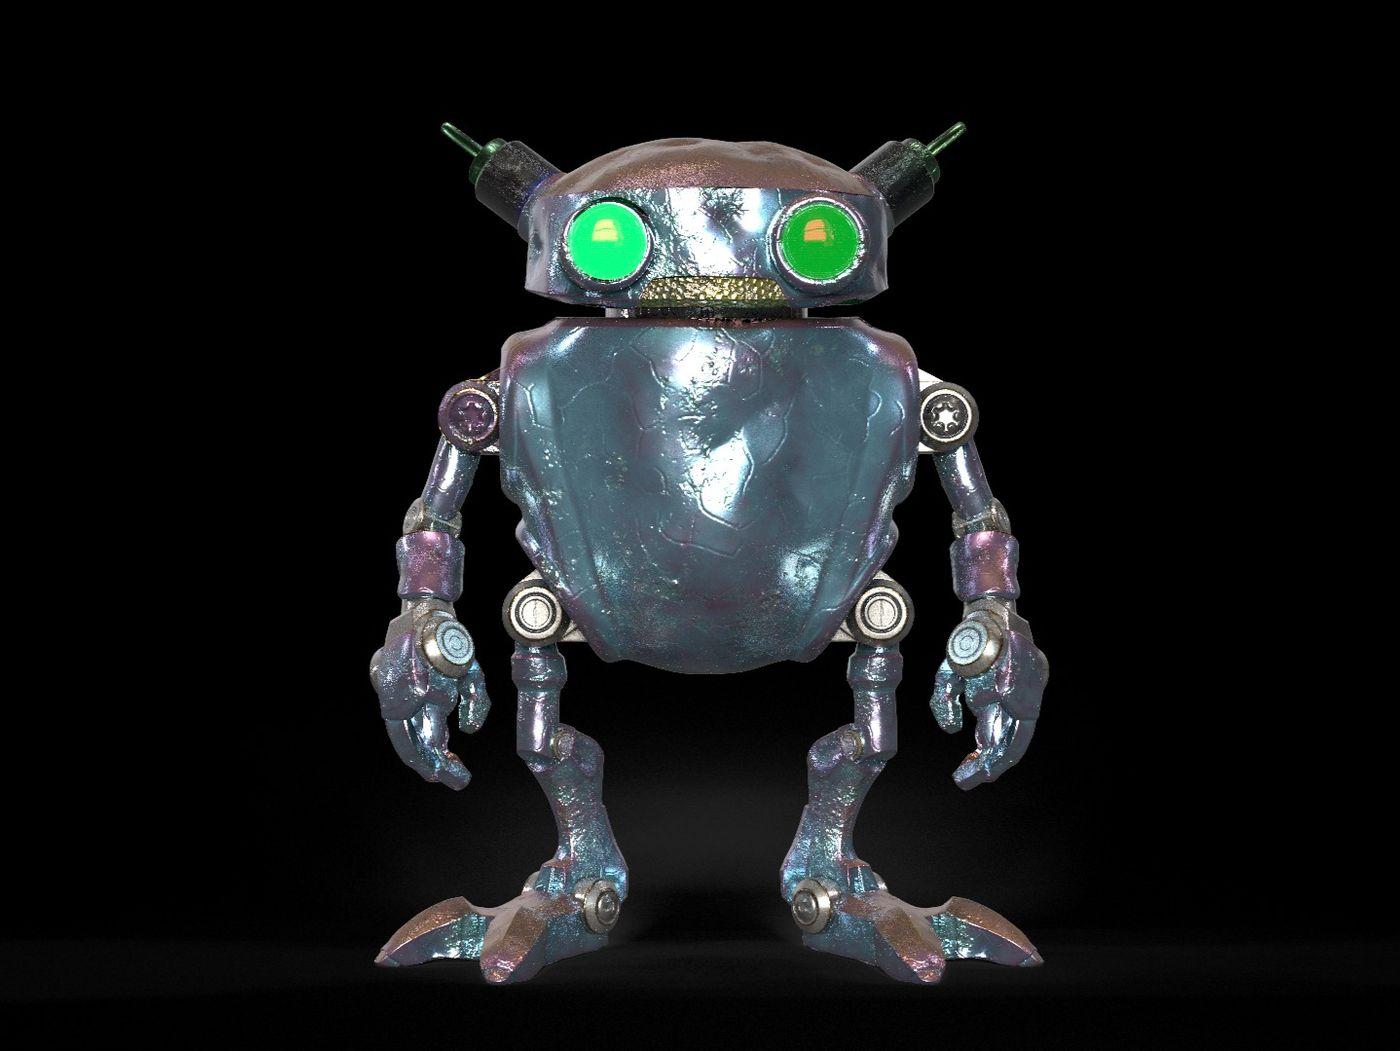 Eddie the robot Entry